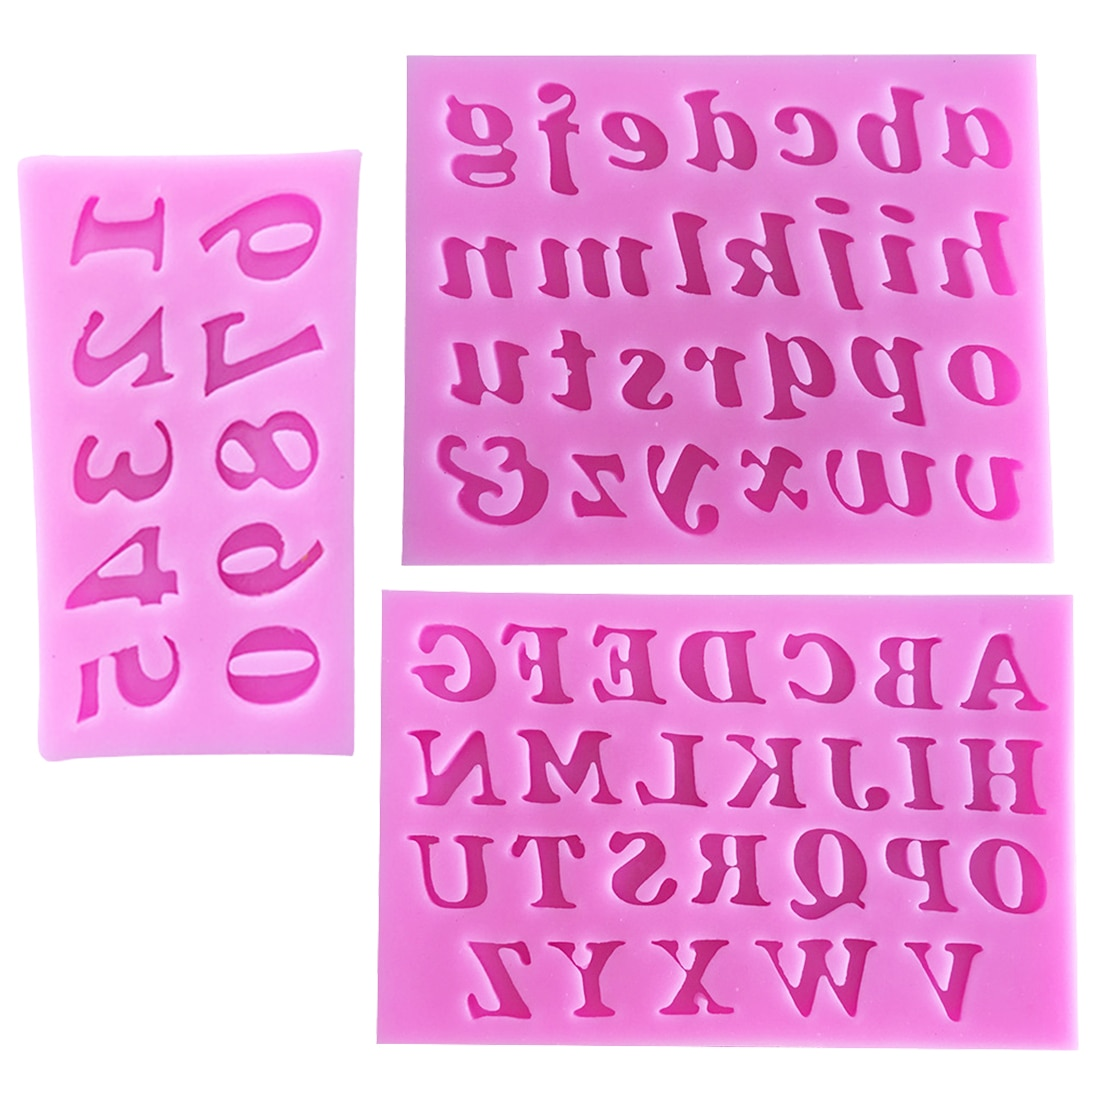 3 unids/set de silicona, accesorios de cocina, moldes de Chocolate con forma de número de letras en inglés, moldes de Fondant para pasteles, plantillas para repostería